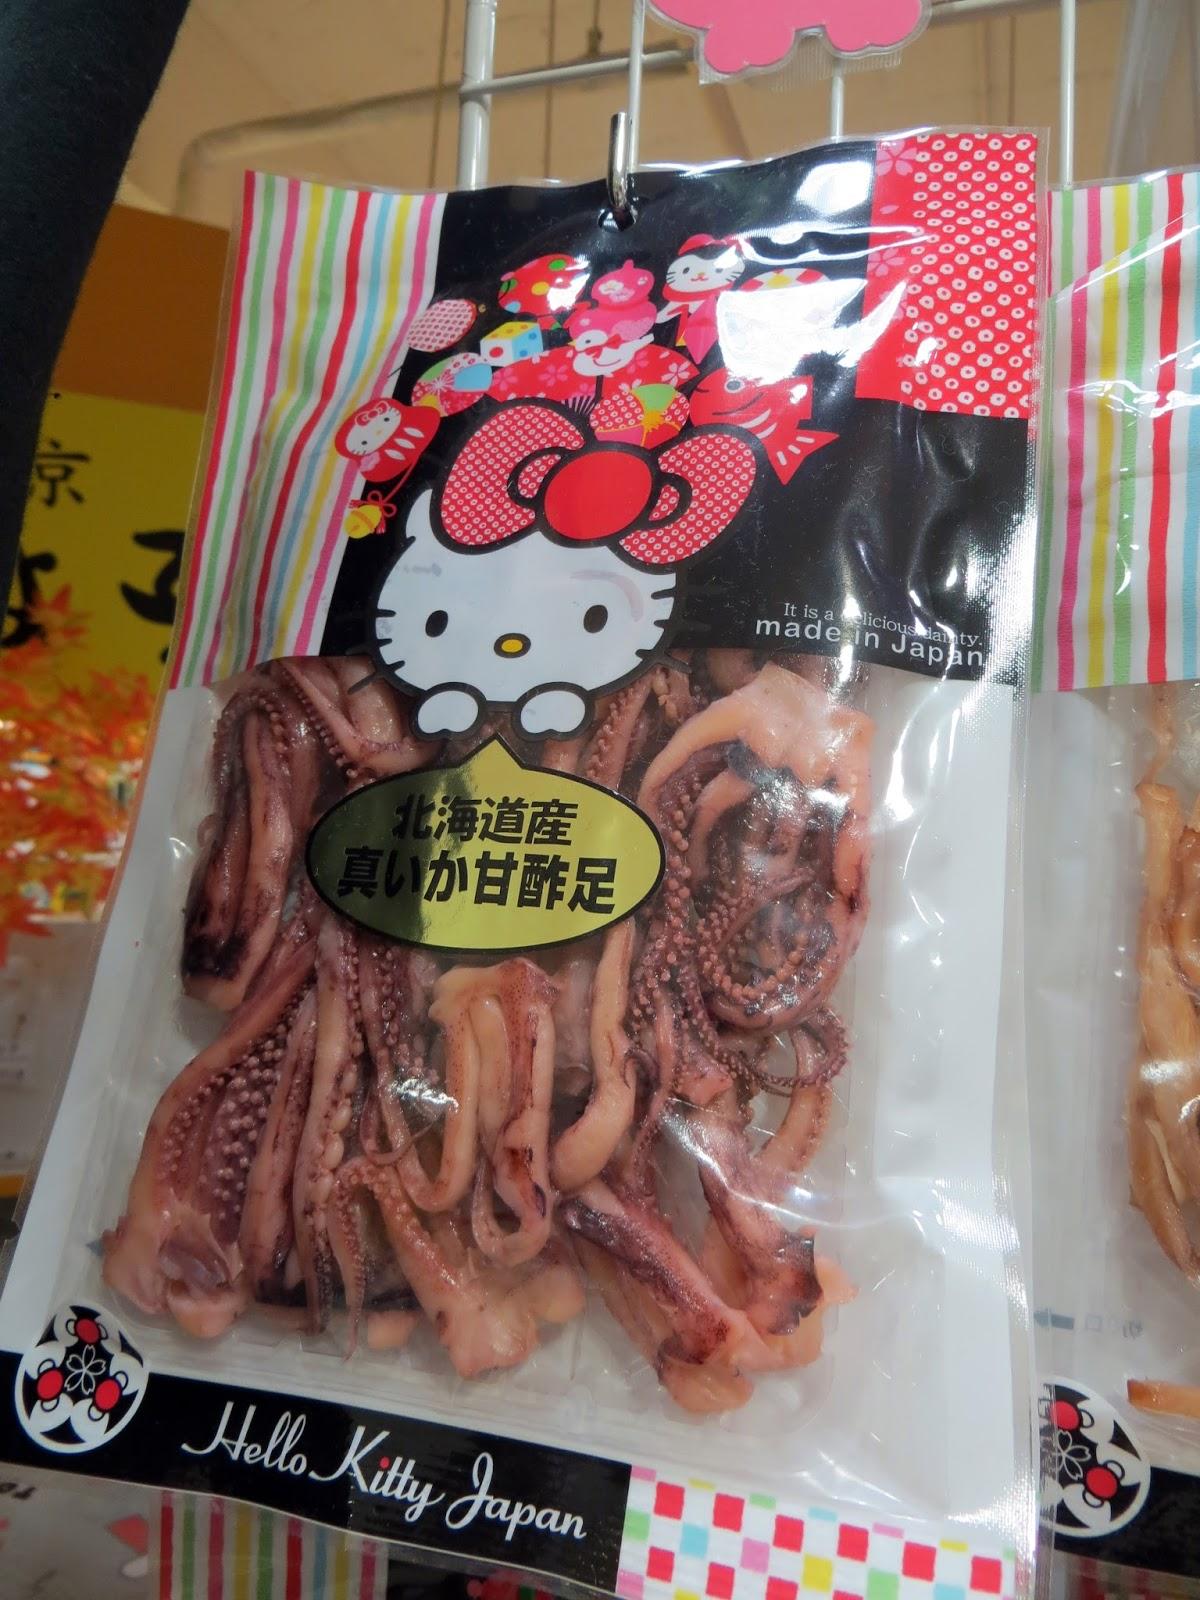 Hello kitty squid, must do tokyo, Japan